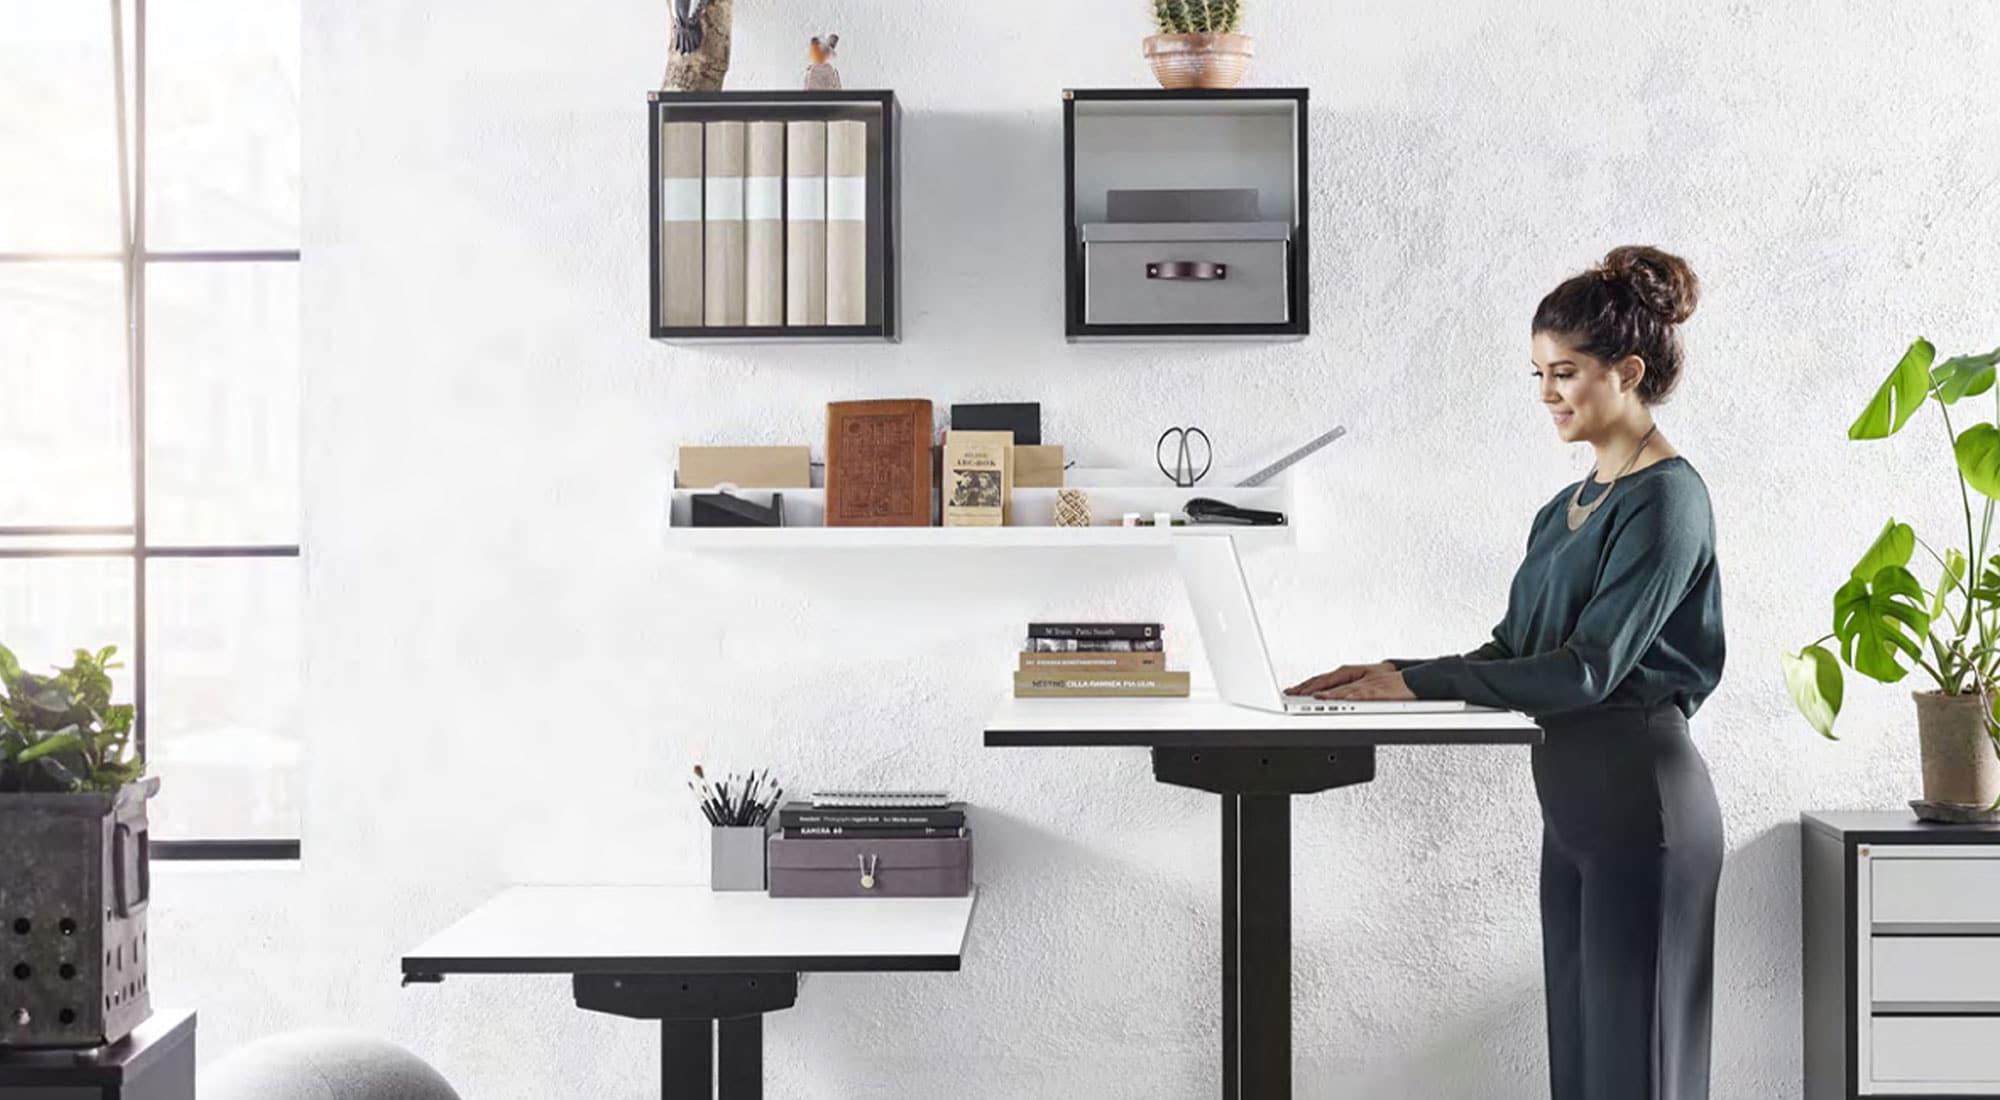 Tackling sedentary behaviour in the workforce